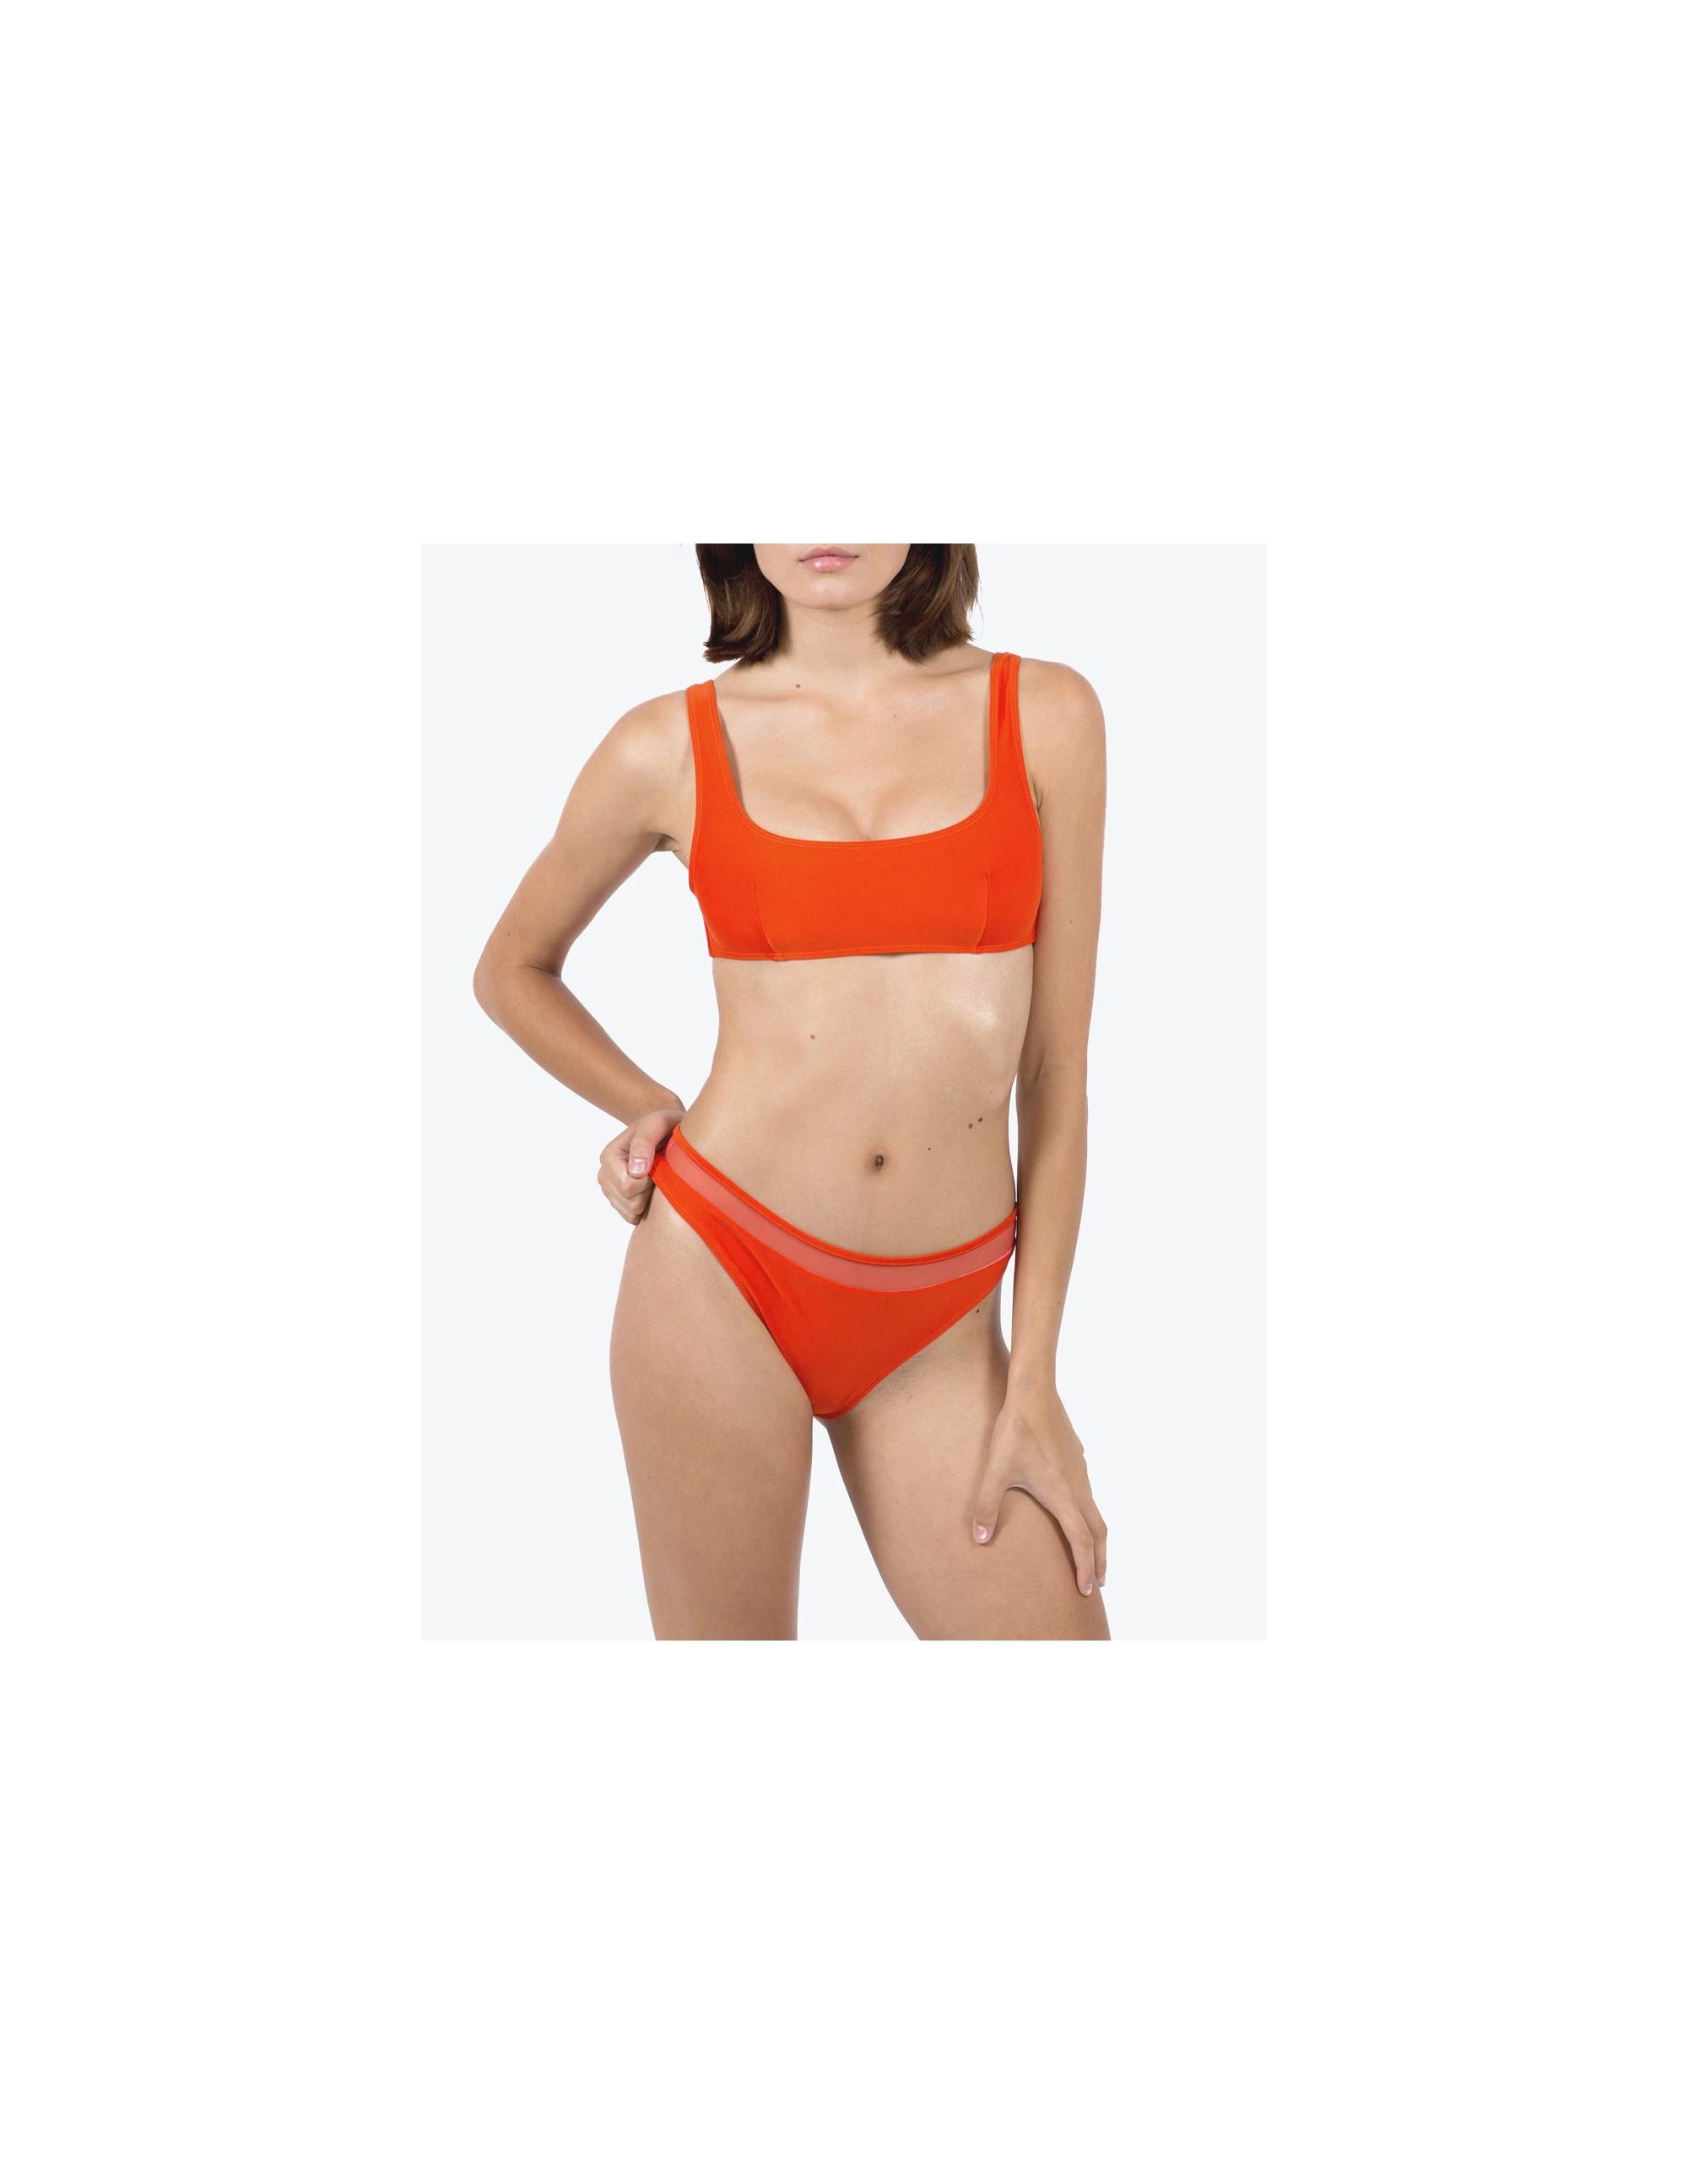 VIK bikini top - CHARACTER RED